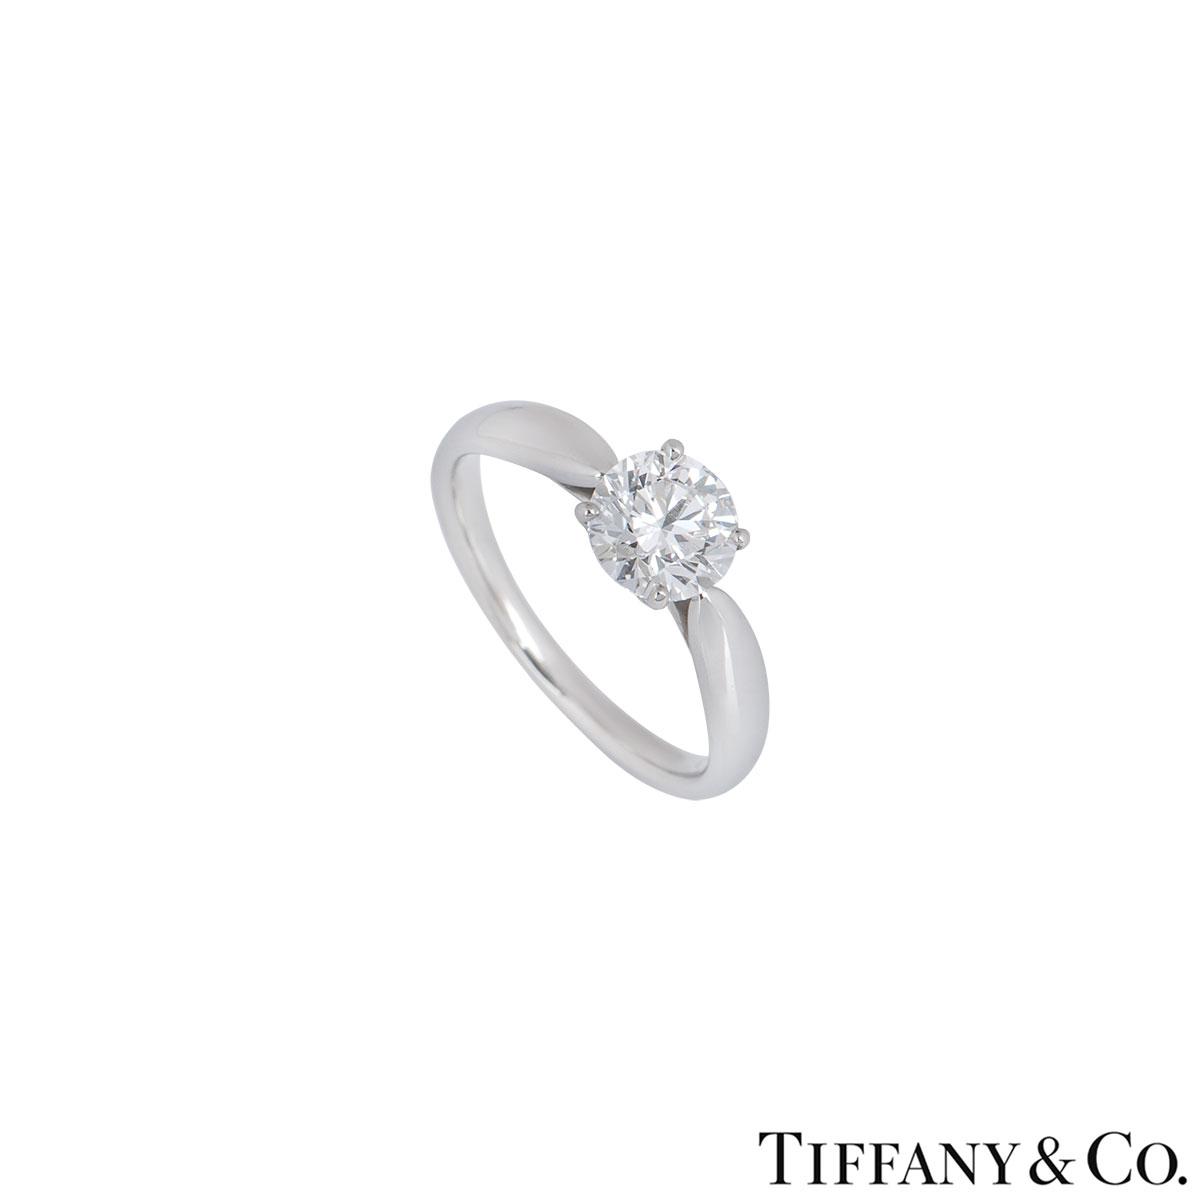 Tiffany & Co. Platinum Diamond Harmony Ring 0.91ct G/VS2